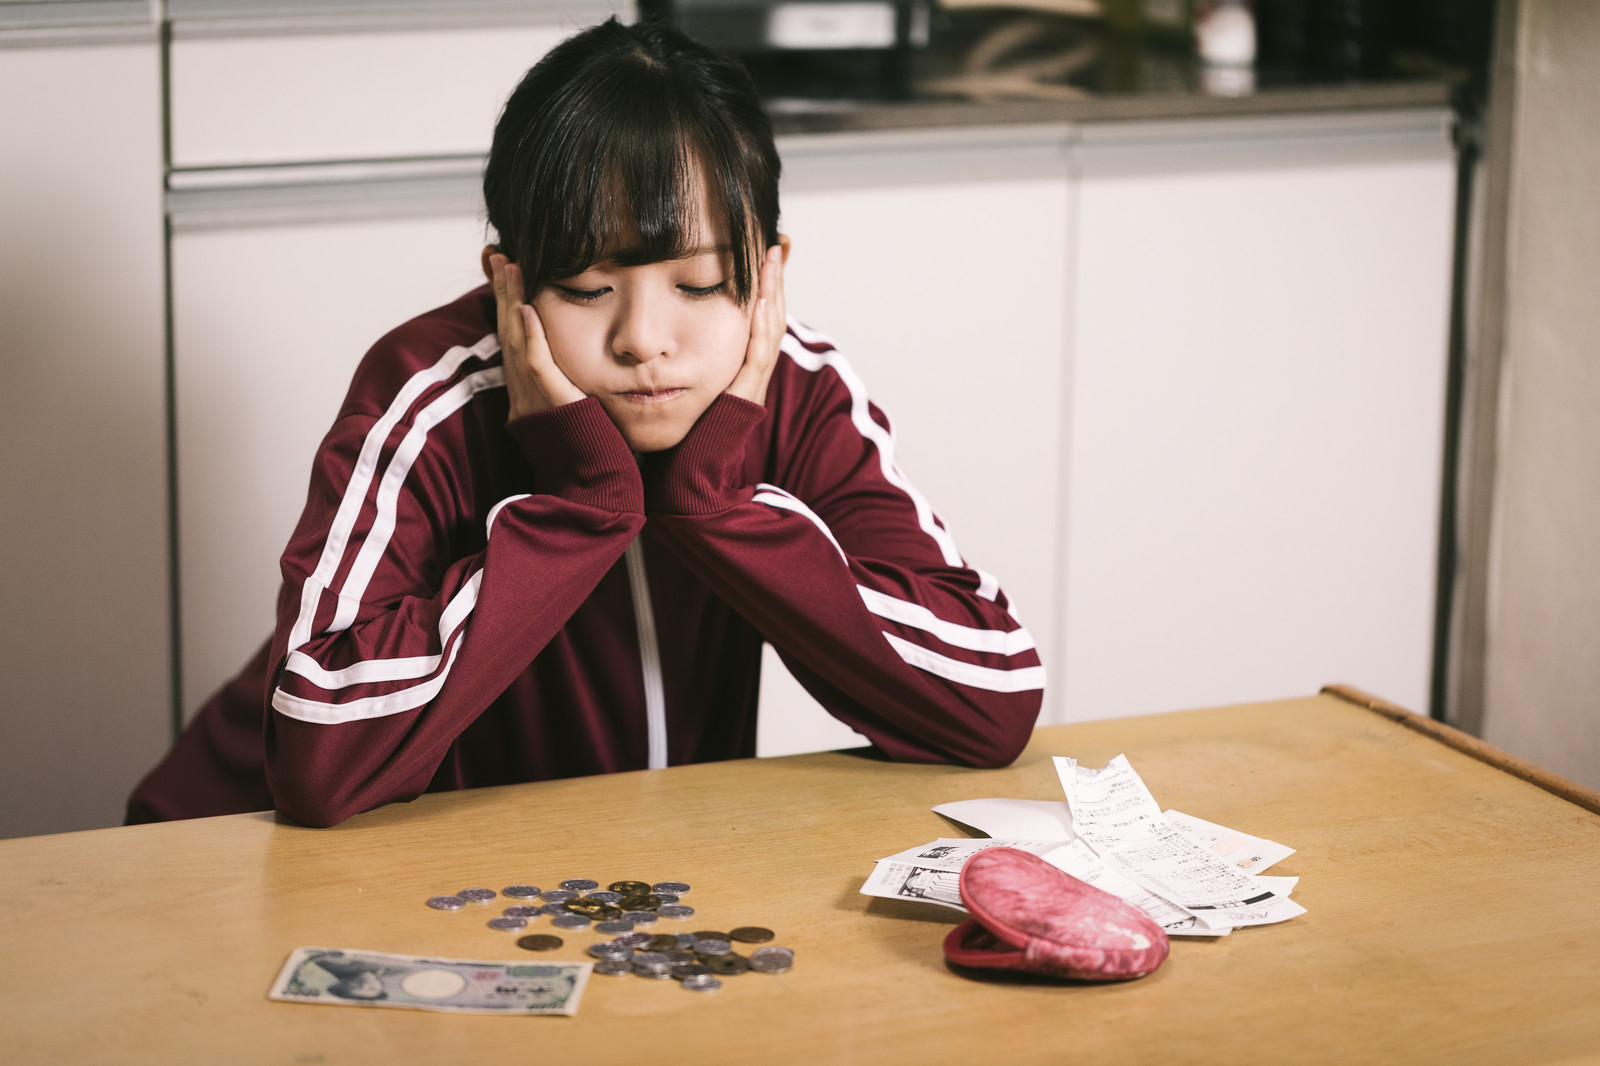 手取り16万円女子